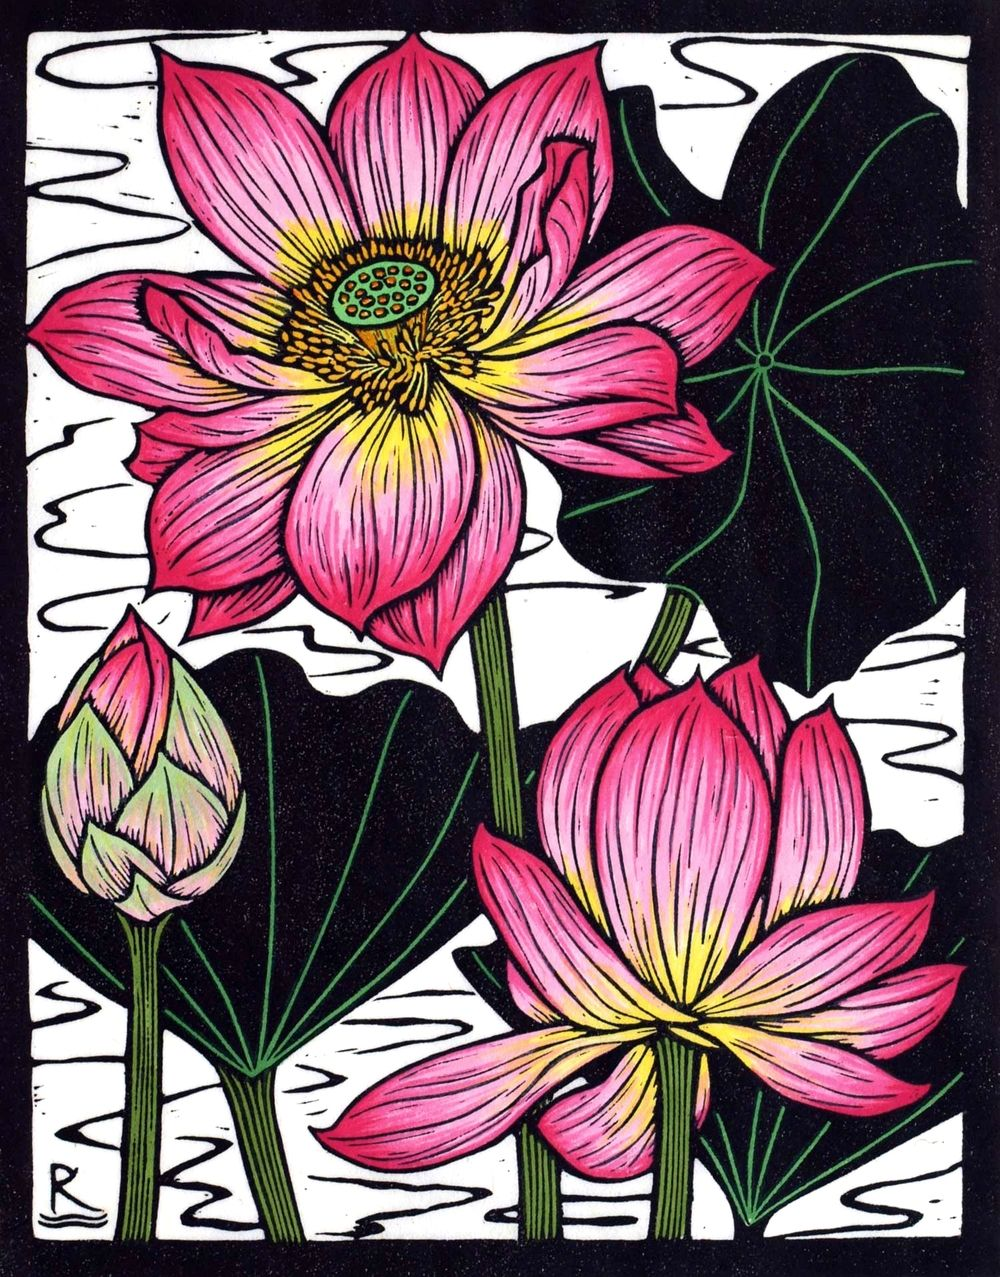 Sacred Lotus I 28 X 22 Cm Edition Of 50 Hand Coloured Linocut On